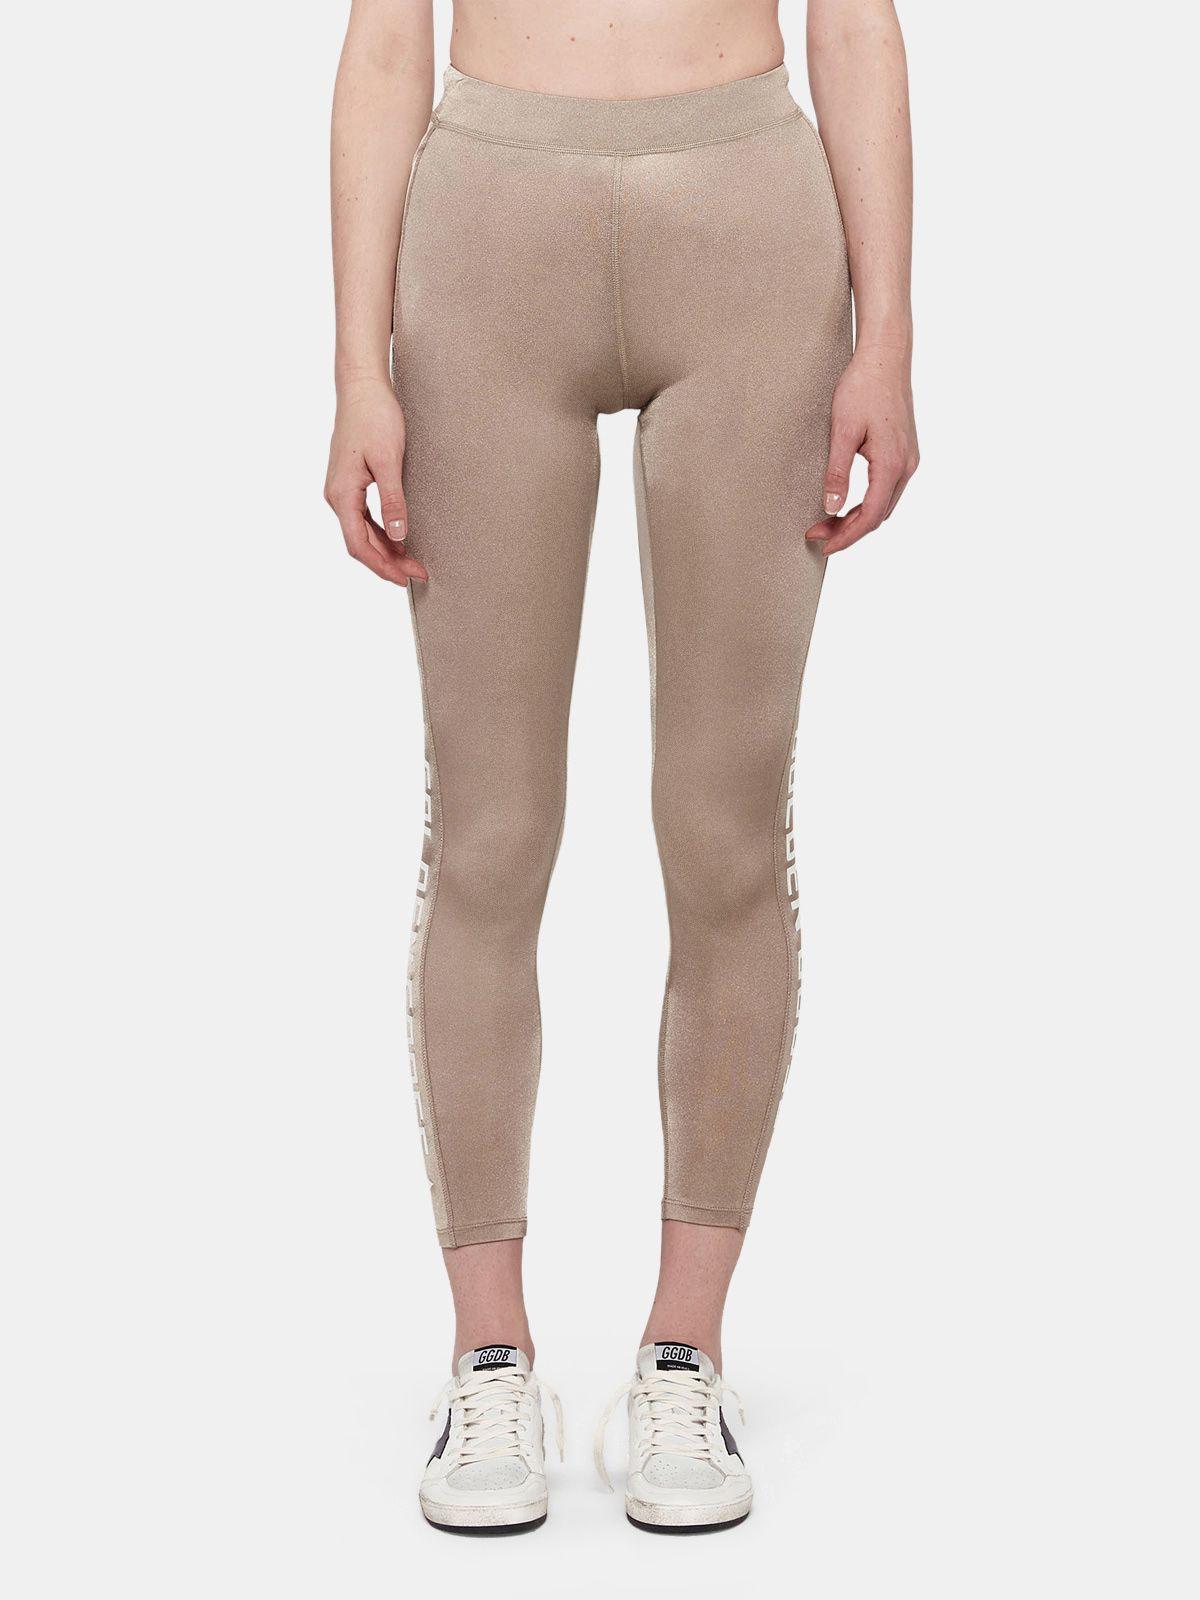 Golden Goose - Nori leggings in technical fabric with printed logo in